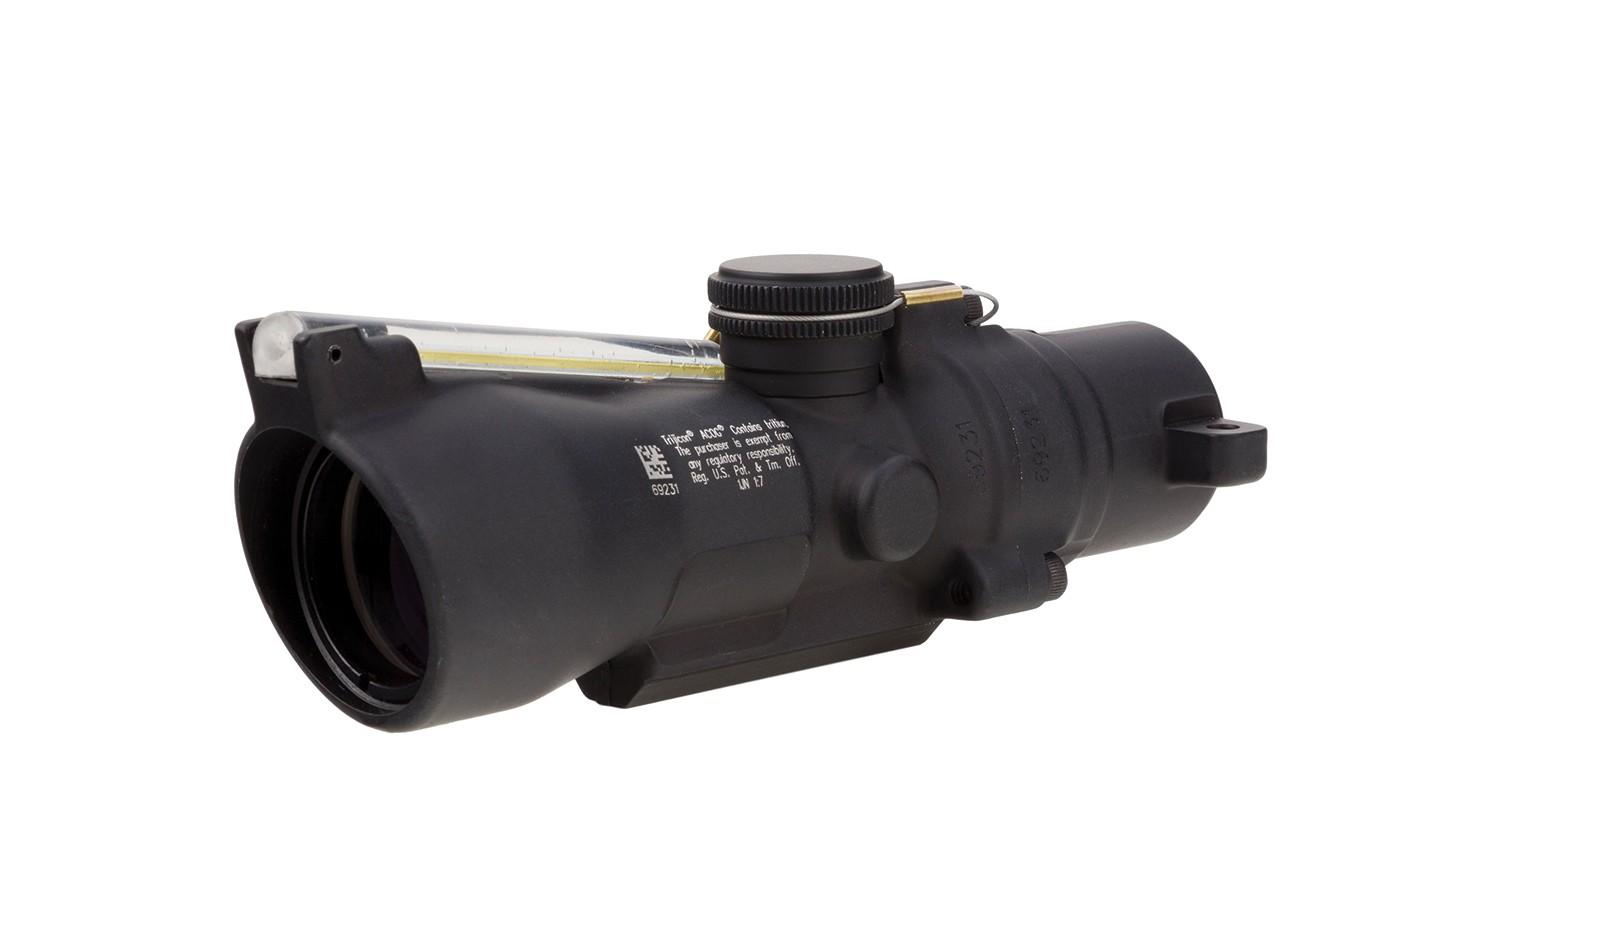 Trijicon ACOG® 3x24 BAC Riflescope - 7.62 x 39mm / 123 Grain